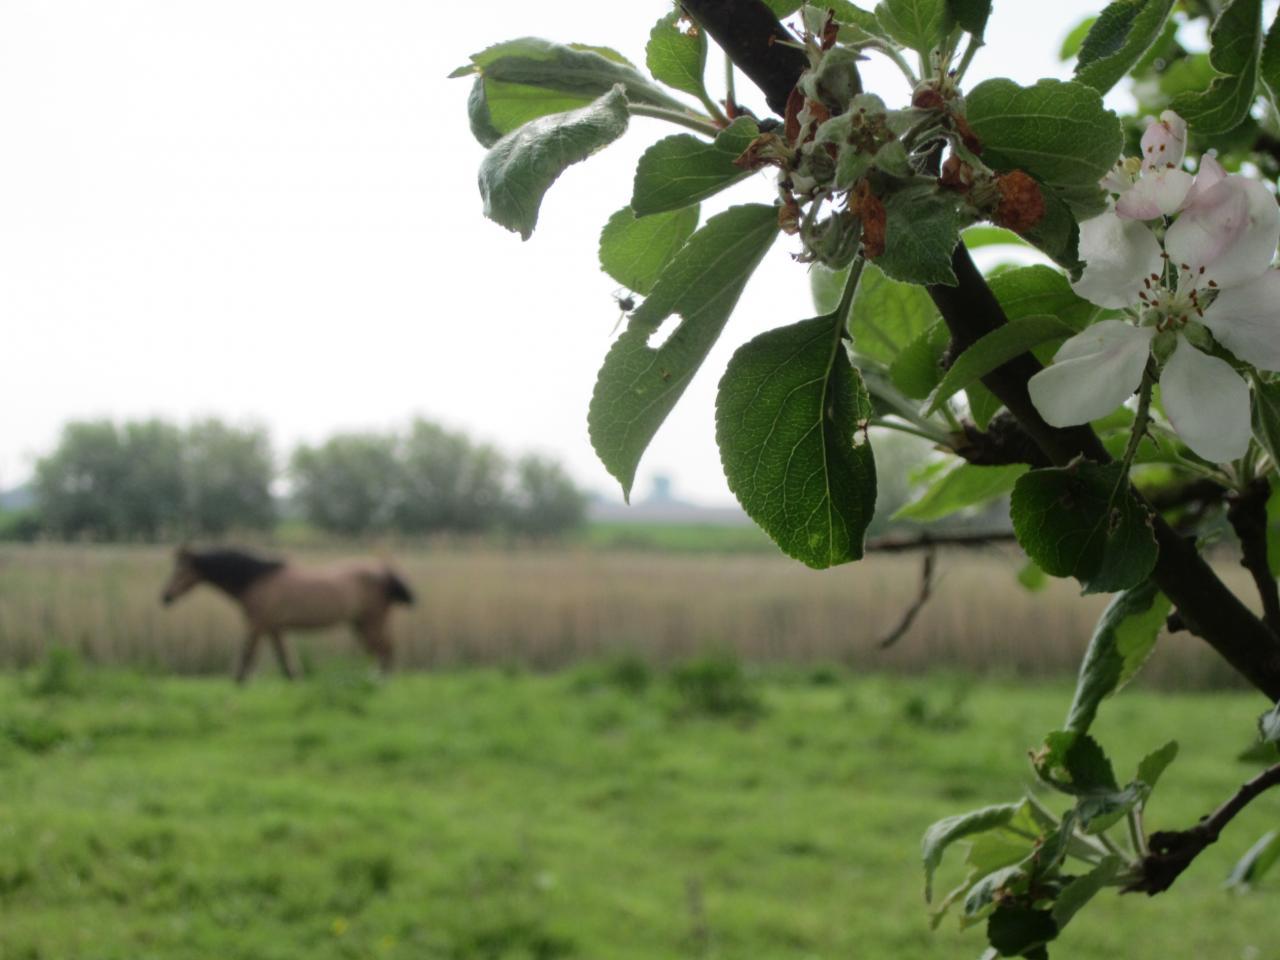 2014-05-01 exteriieur ferme cheval ane poney